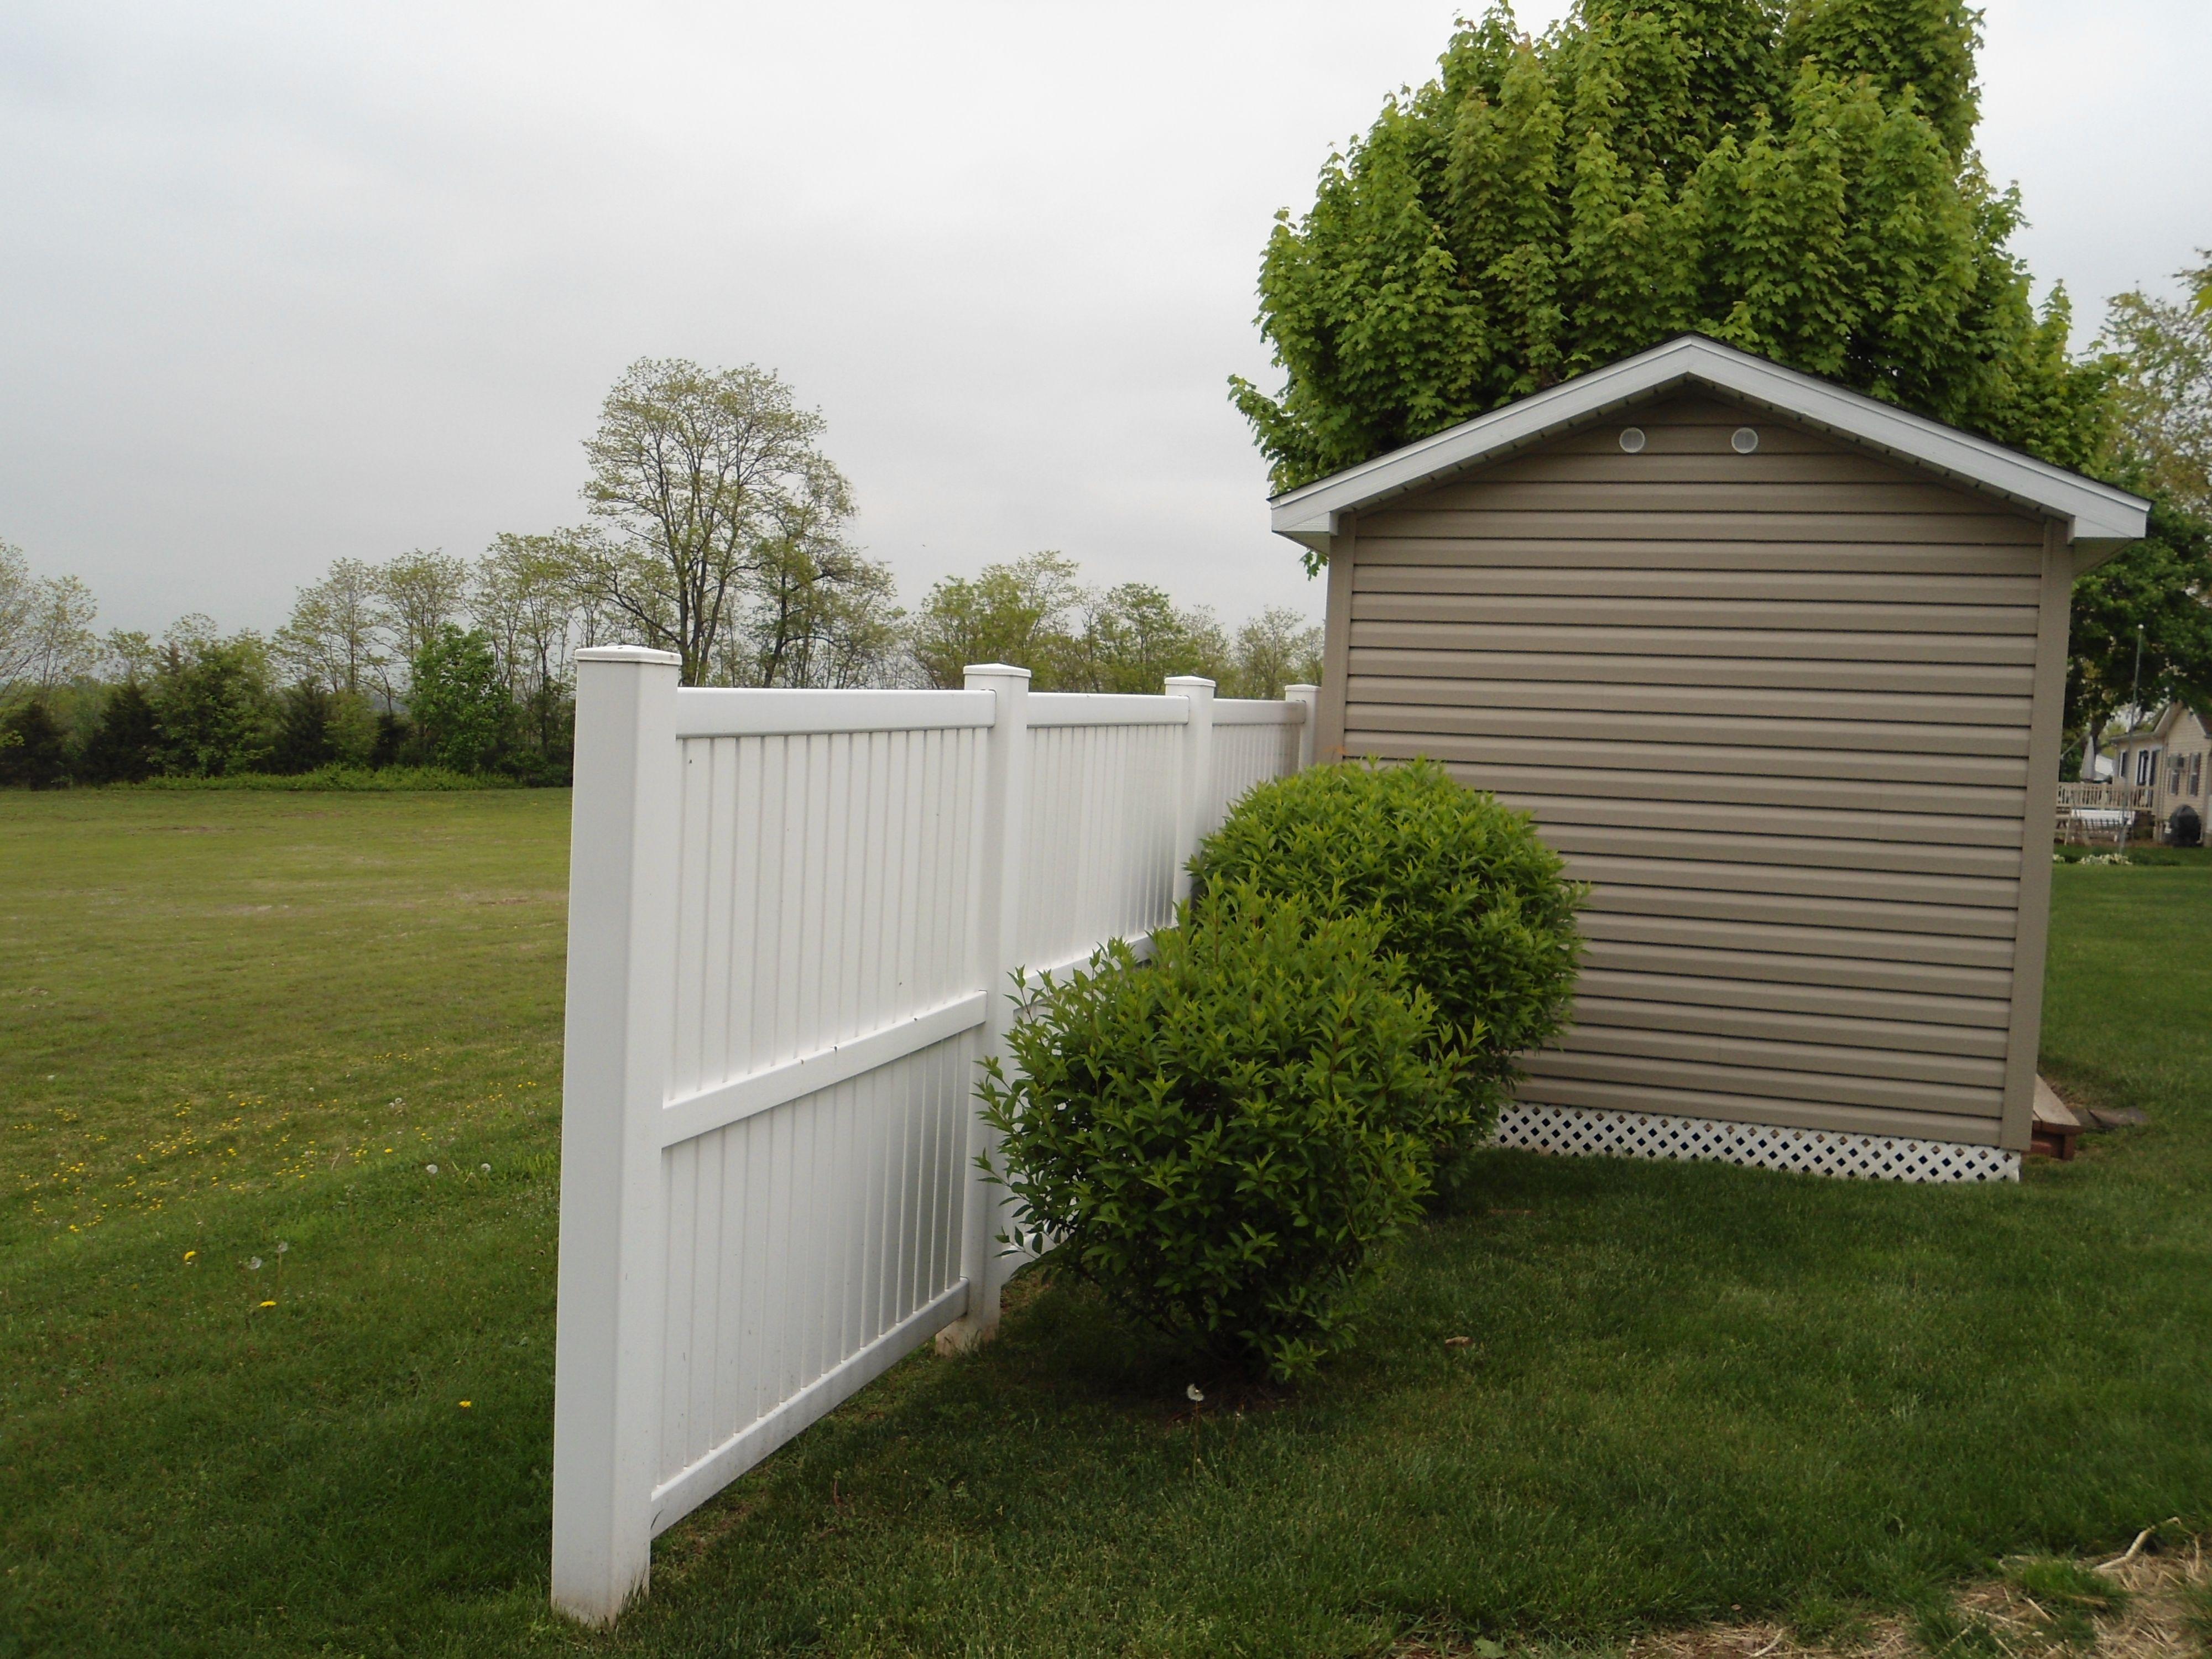 Maintenance Free Imperial Yard Fence | Garage doors, Parts ...